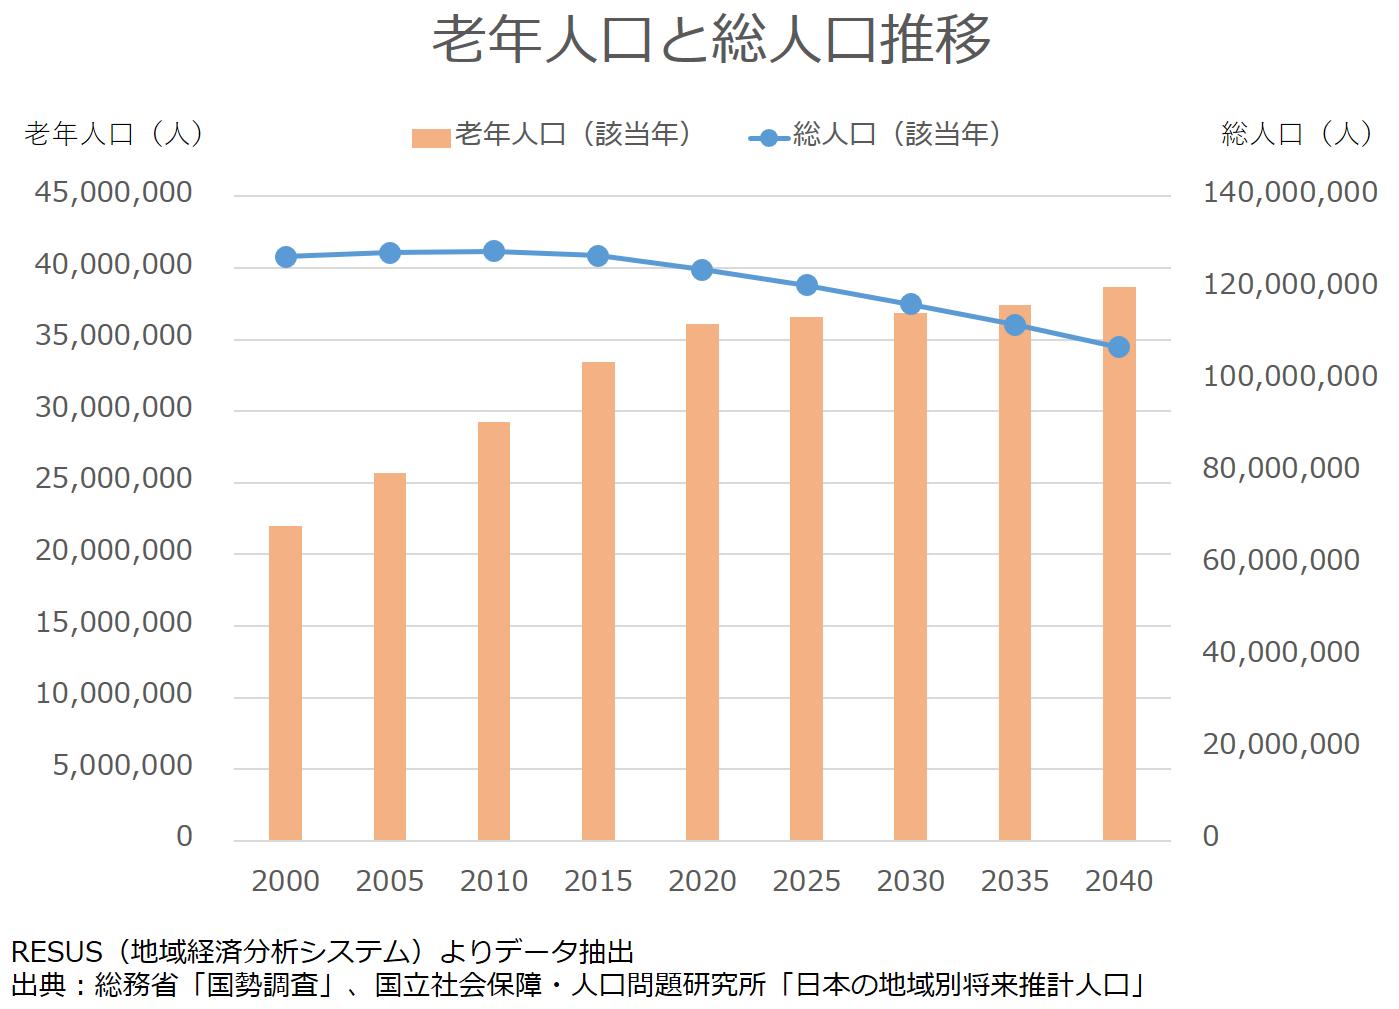 老年人口と総人口